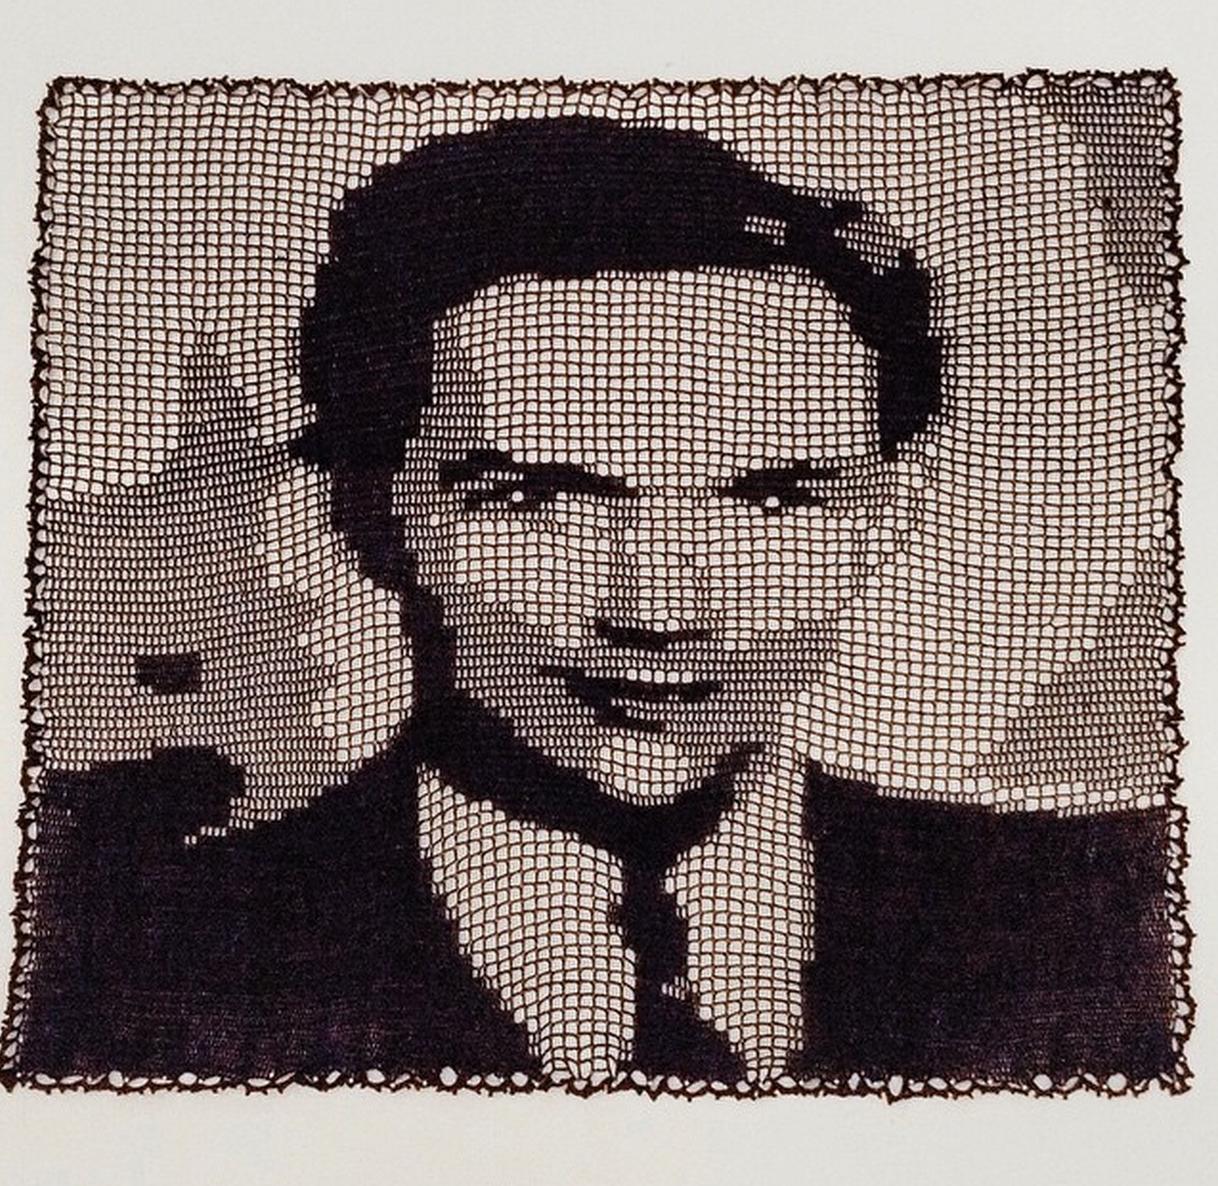 filet-crochet-portraits-1